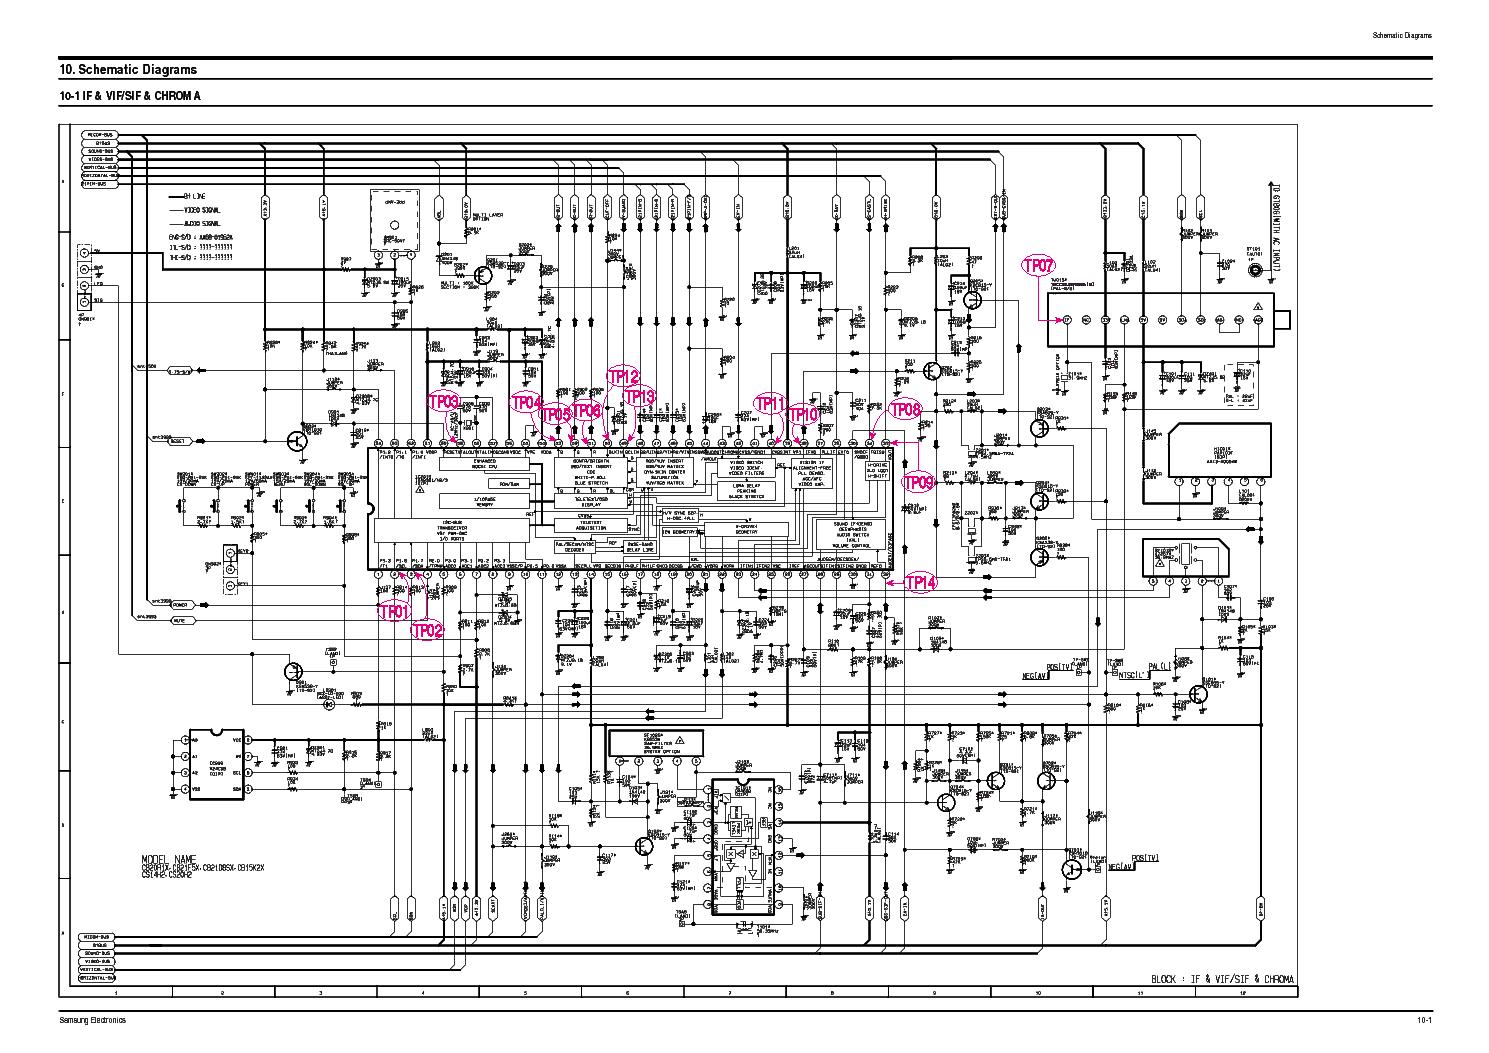 free tv schematics service manuals motor schematics elsavadorla